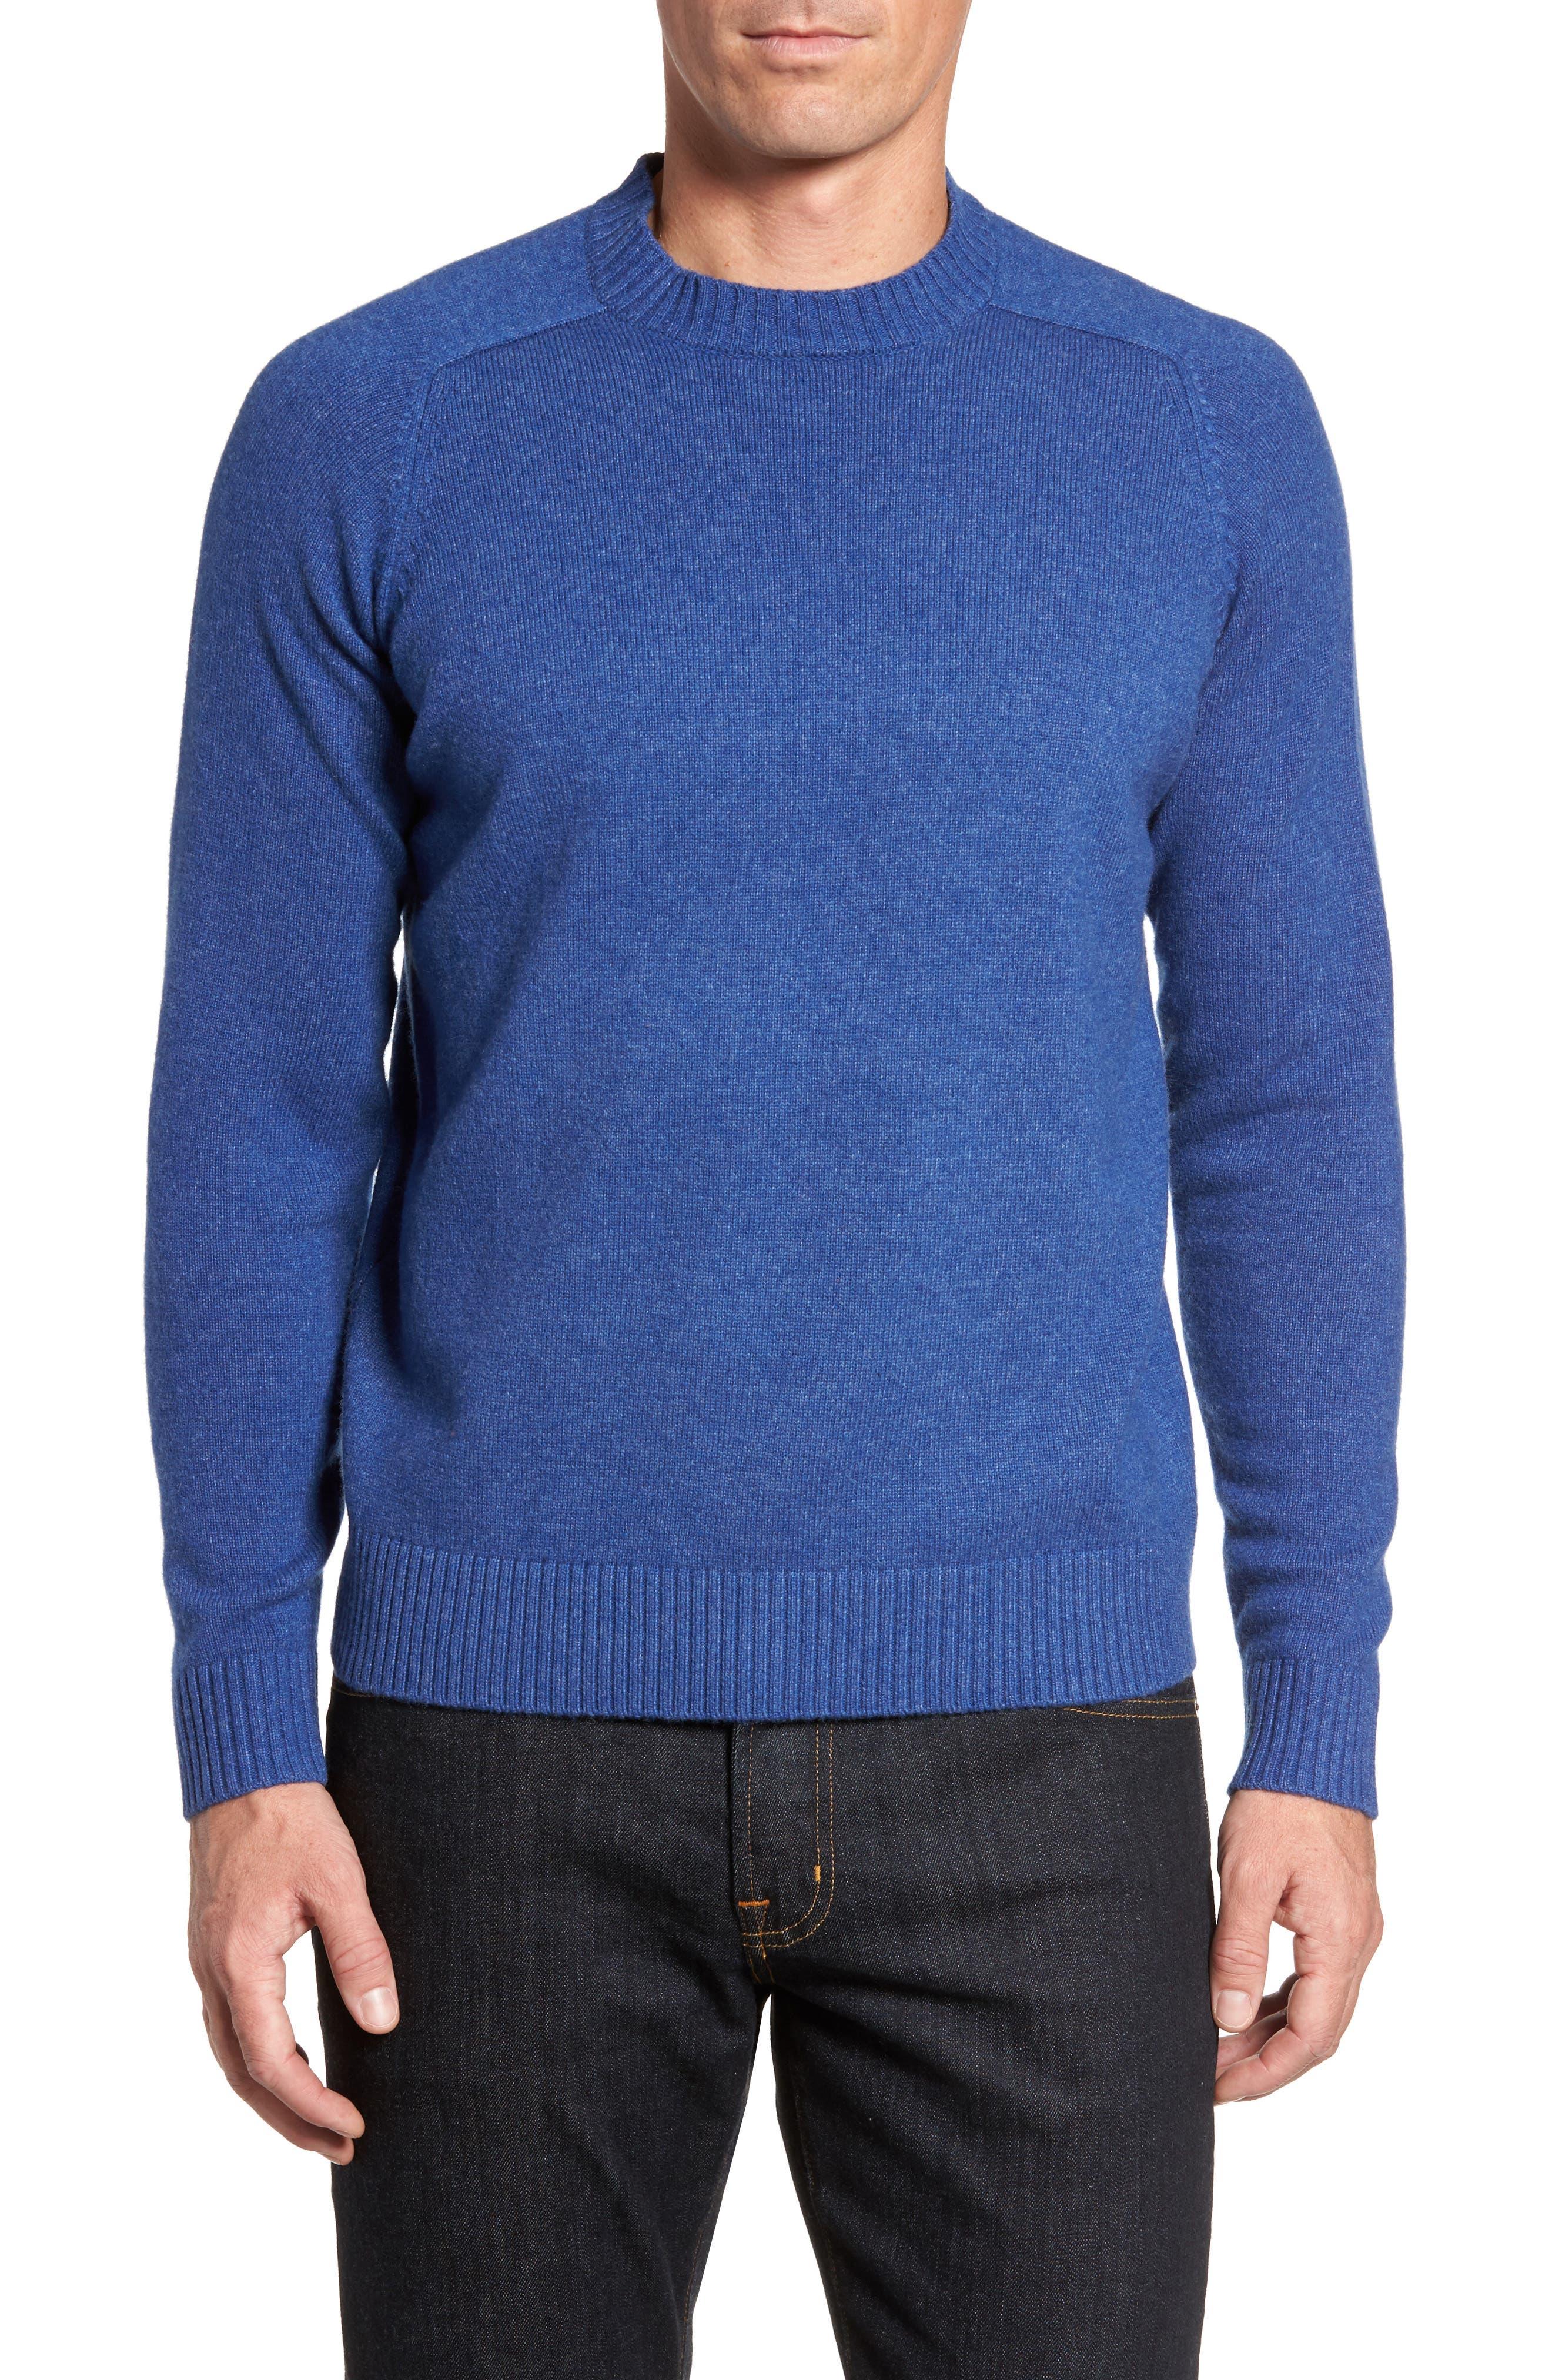 Crown Vintage Crewneck Sweatshirt,                             Main thumbnail 2, color,